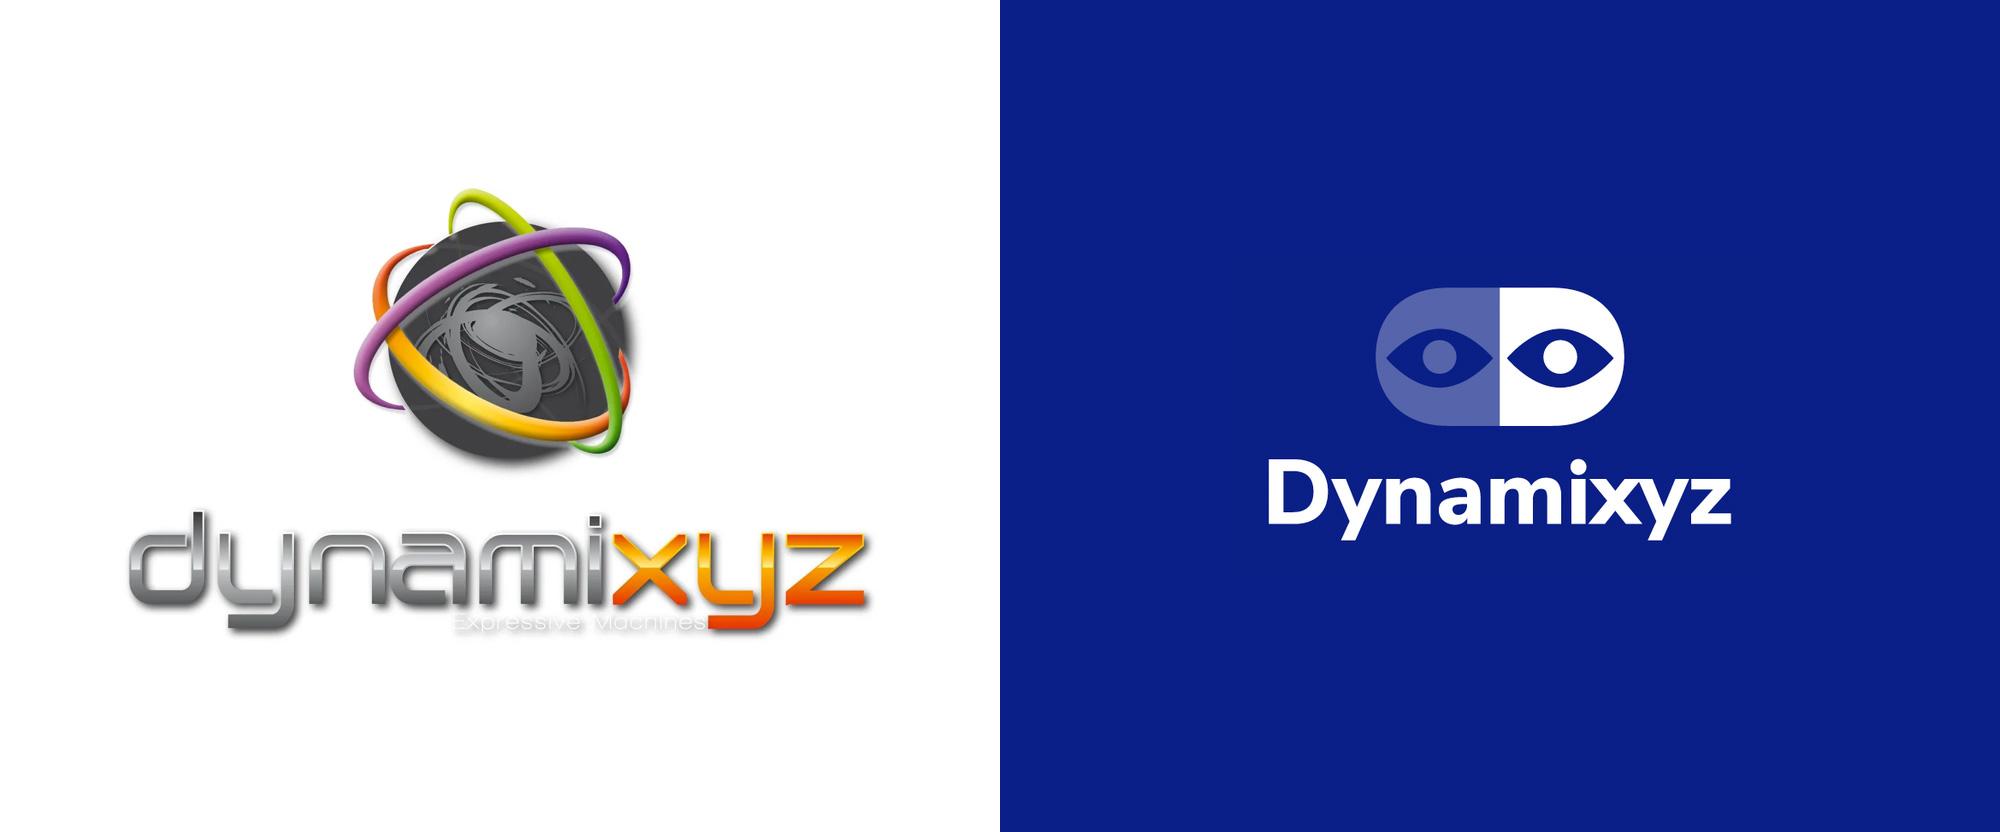 New Logo and Identity for Dynamixyz by Atelier Julian Legendre